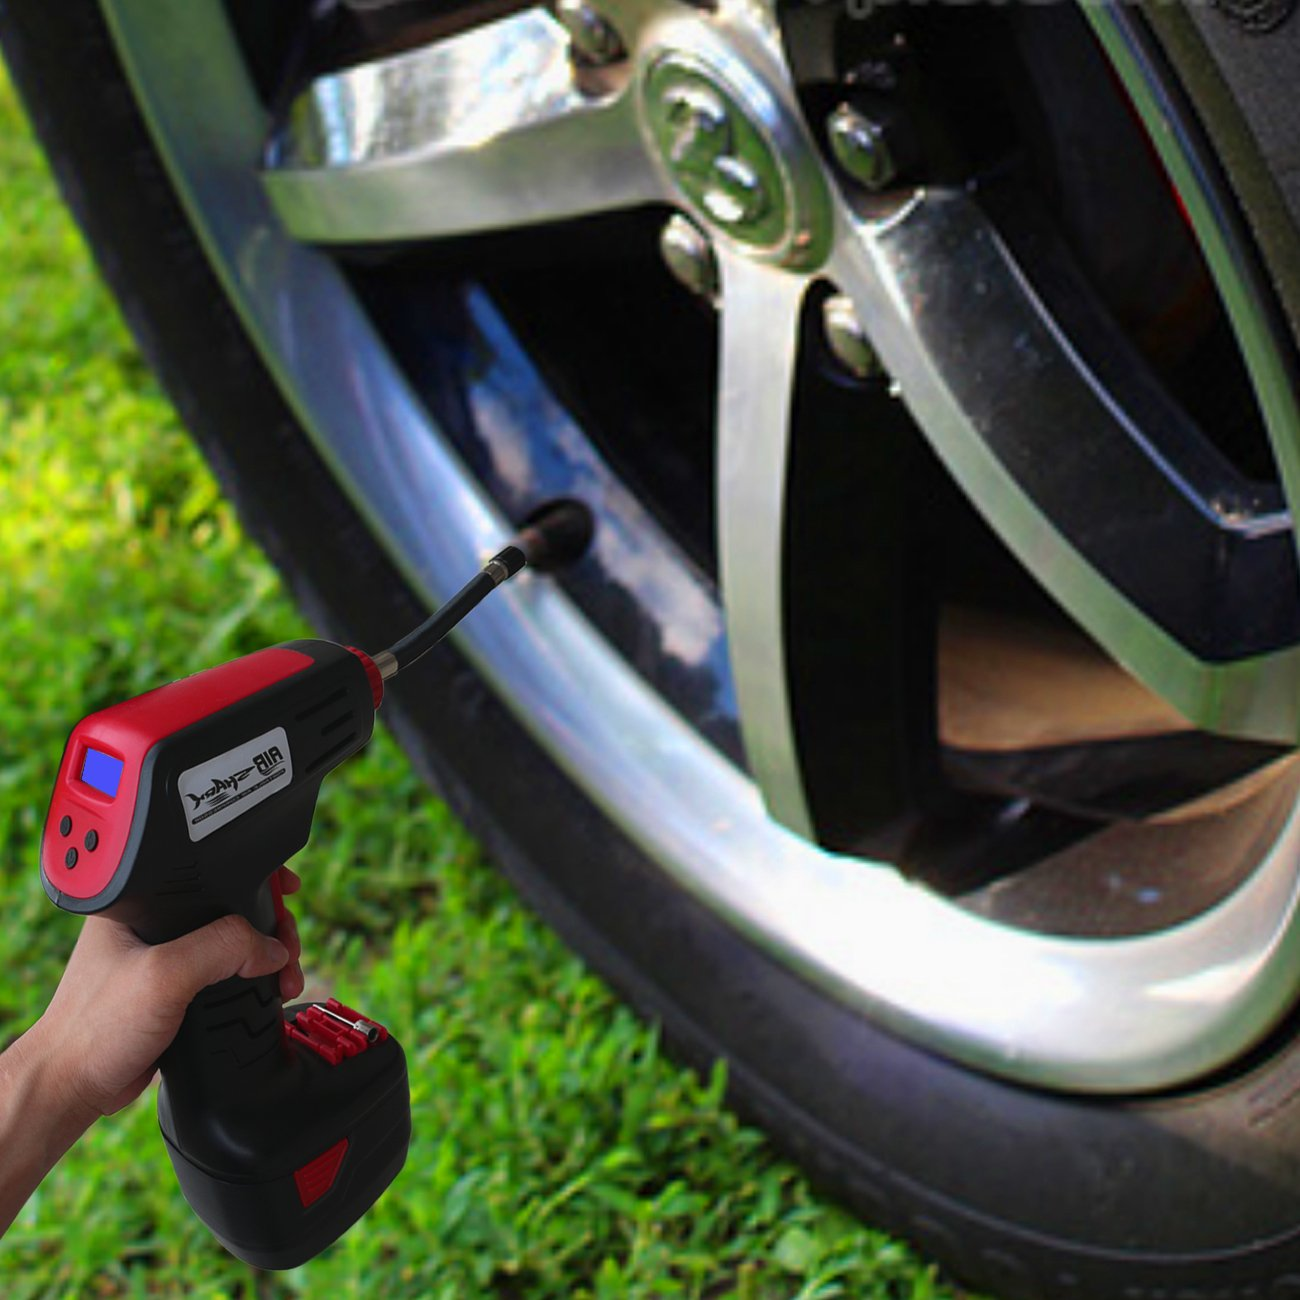 Amazon.com: Tisnec Pro Air Compressor, Cordless Portable Compressor Electric Inflator Portable Hand Held Pump with Digital LCD: Home Improvement